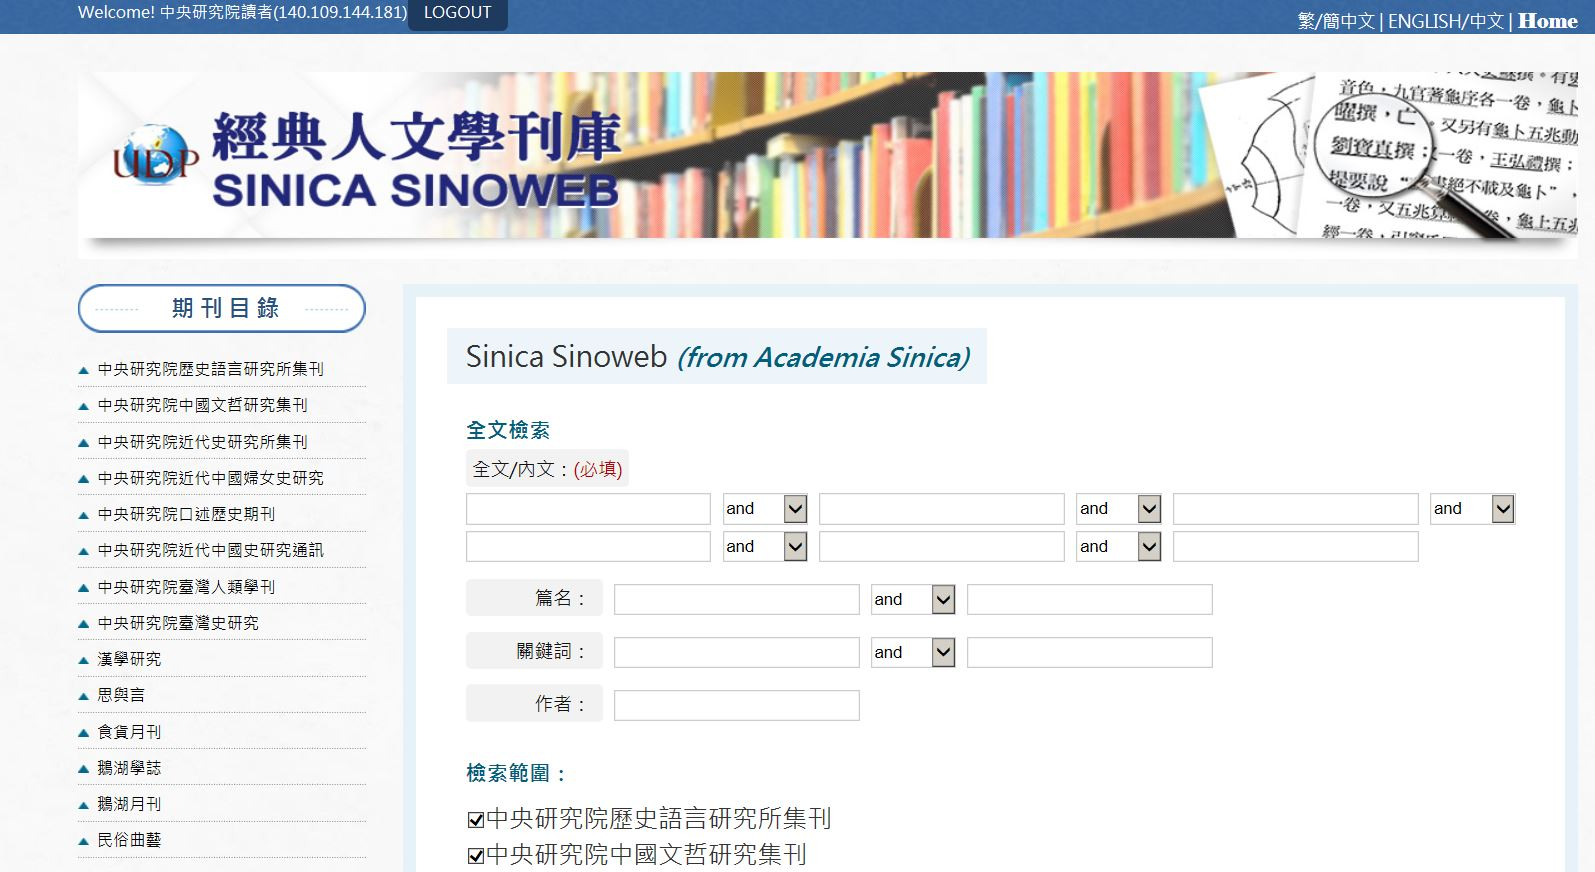 Sinica Sinoweb